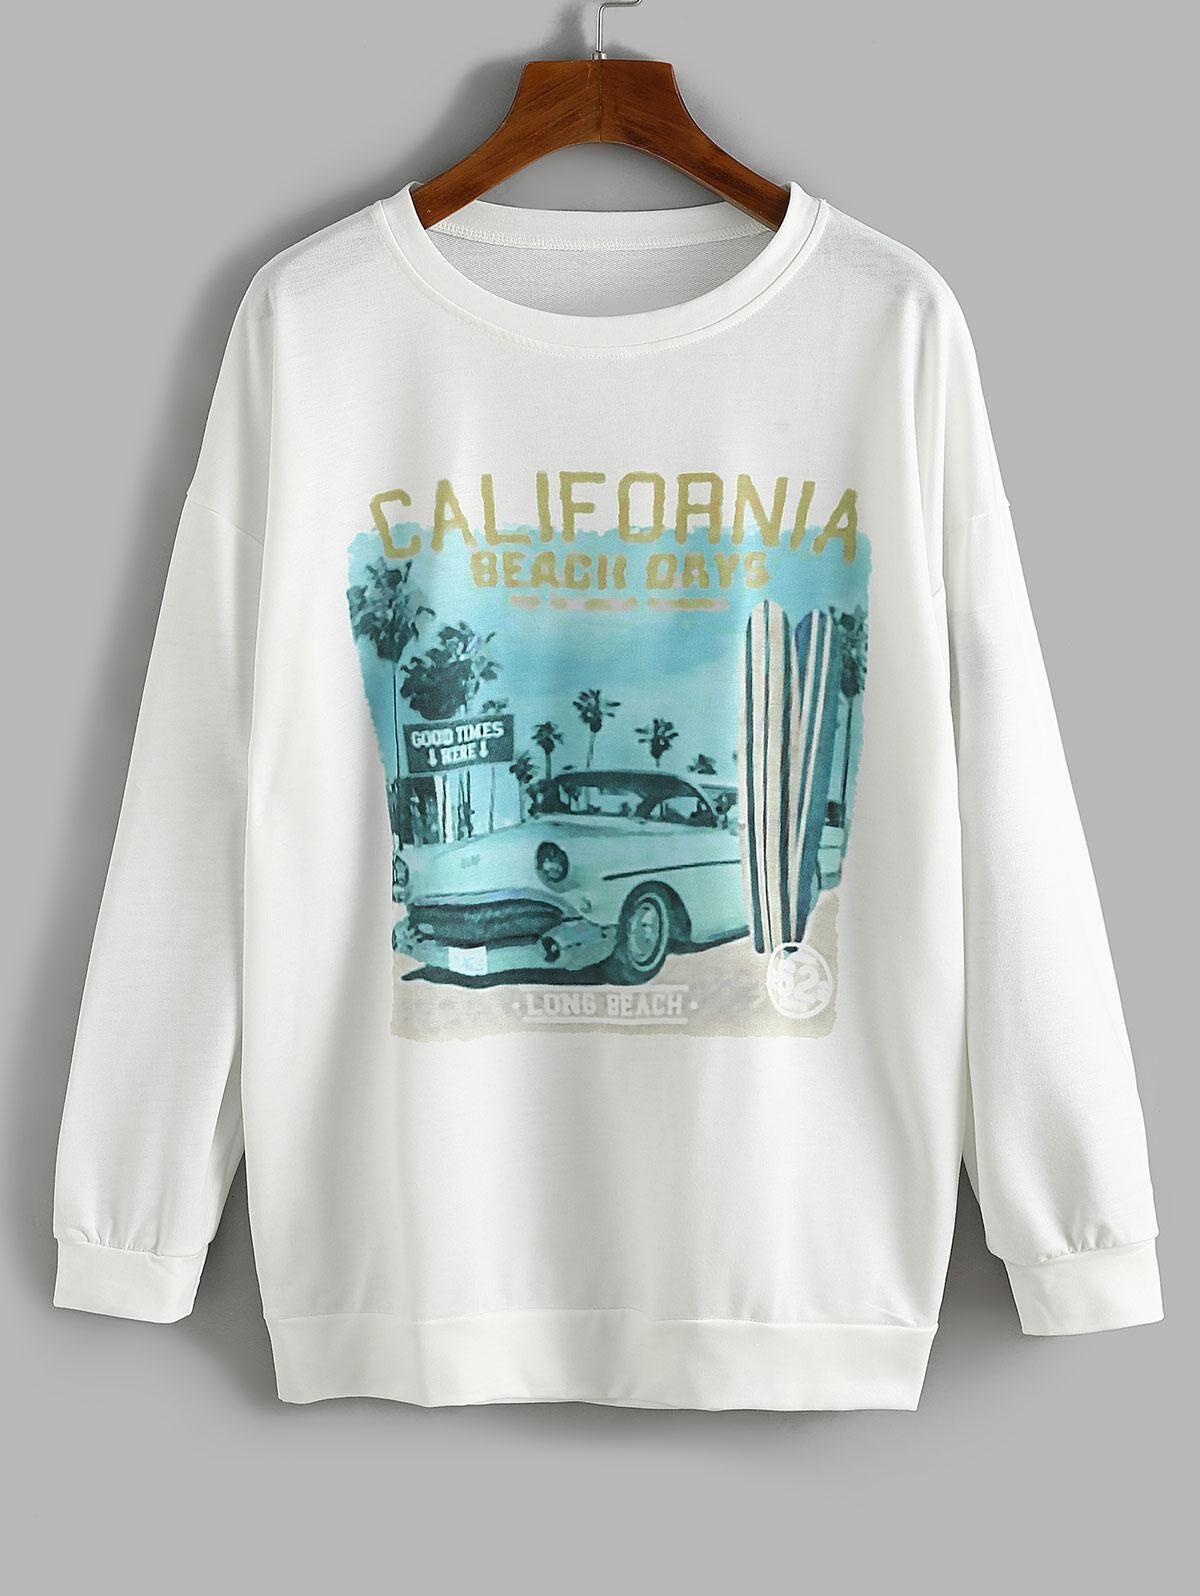 Oversize Car CALIFORNIA Graphic Sweatshirt in WHITE - Size: Small